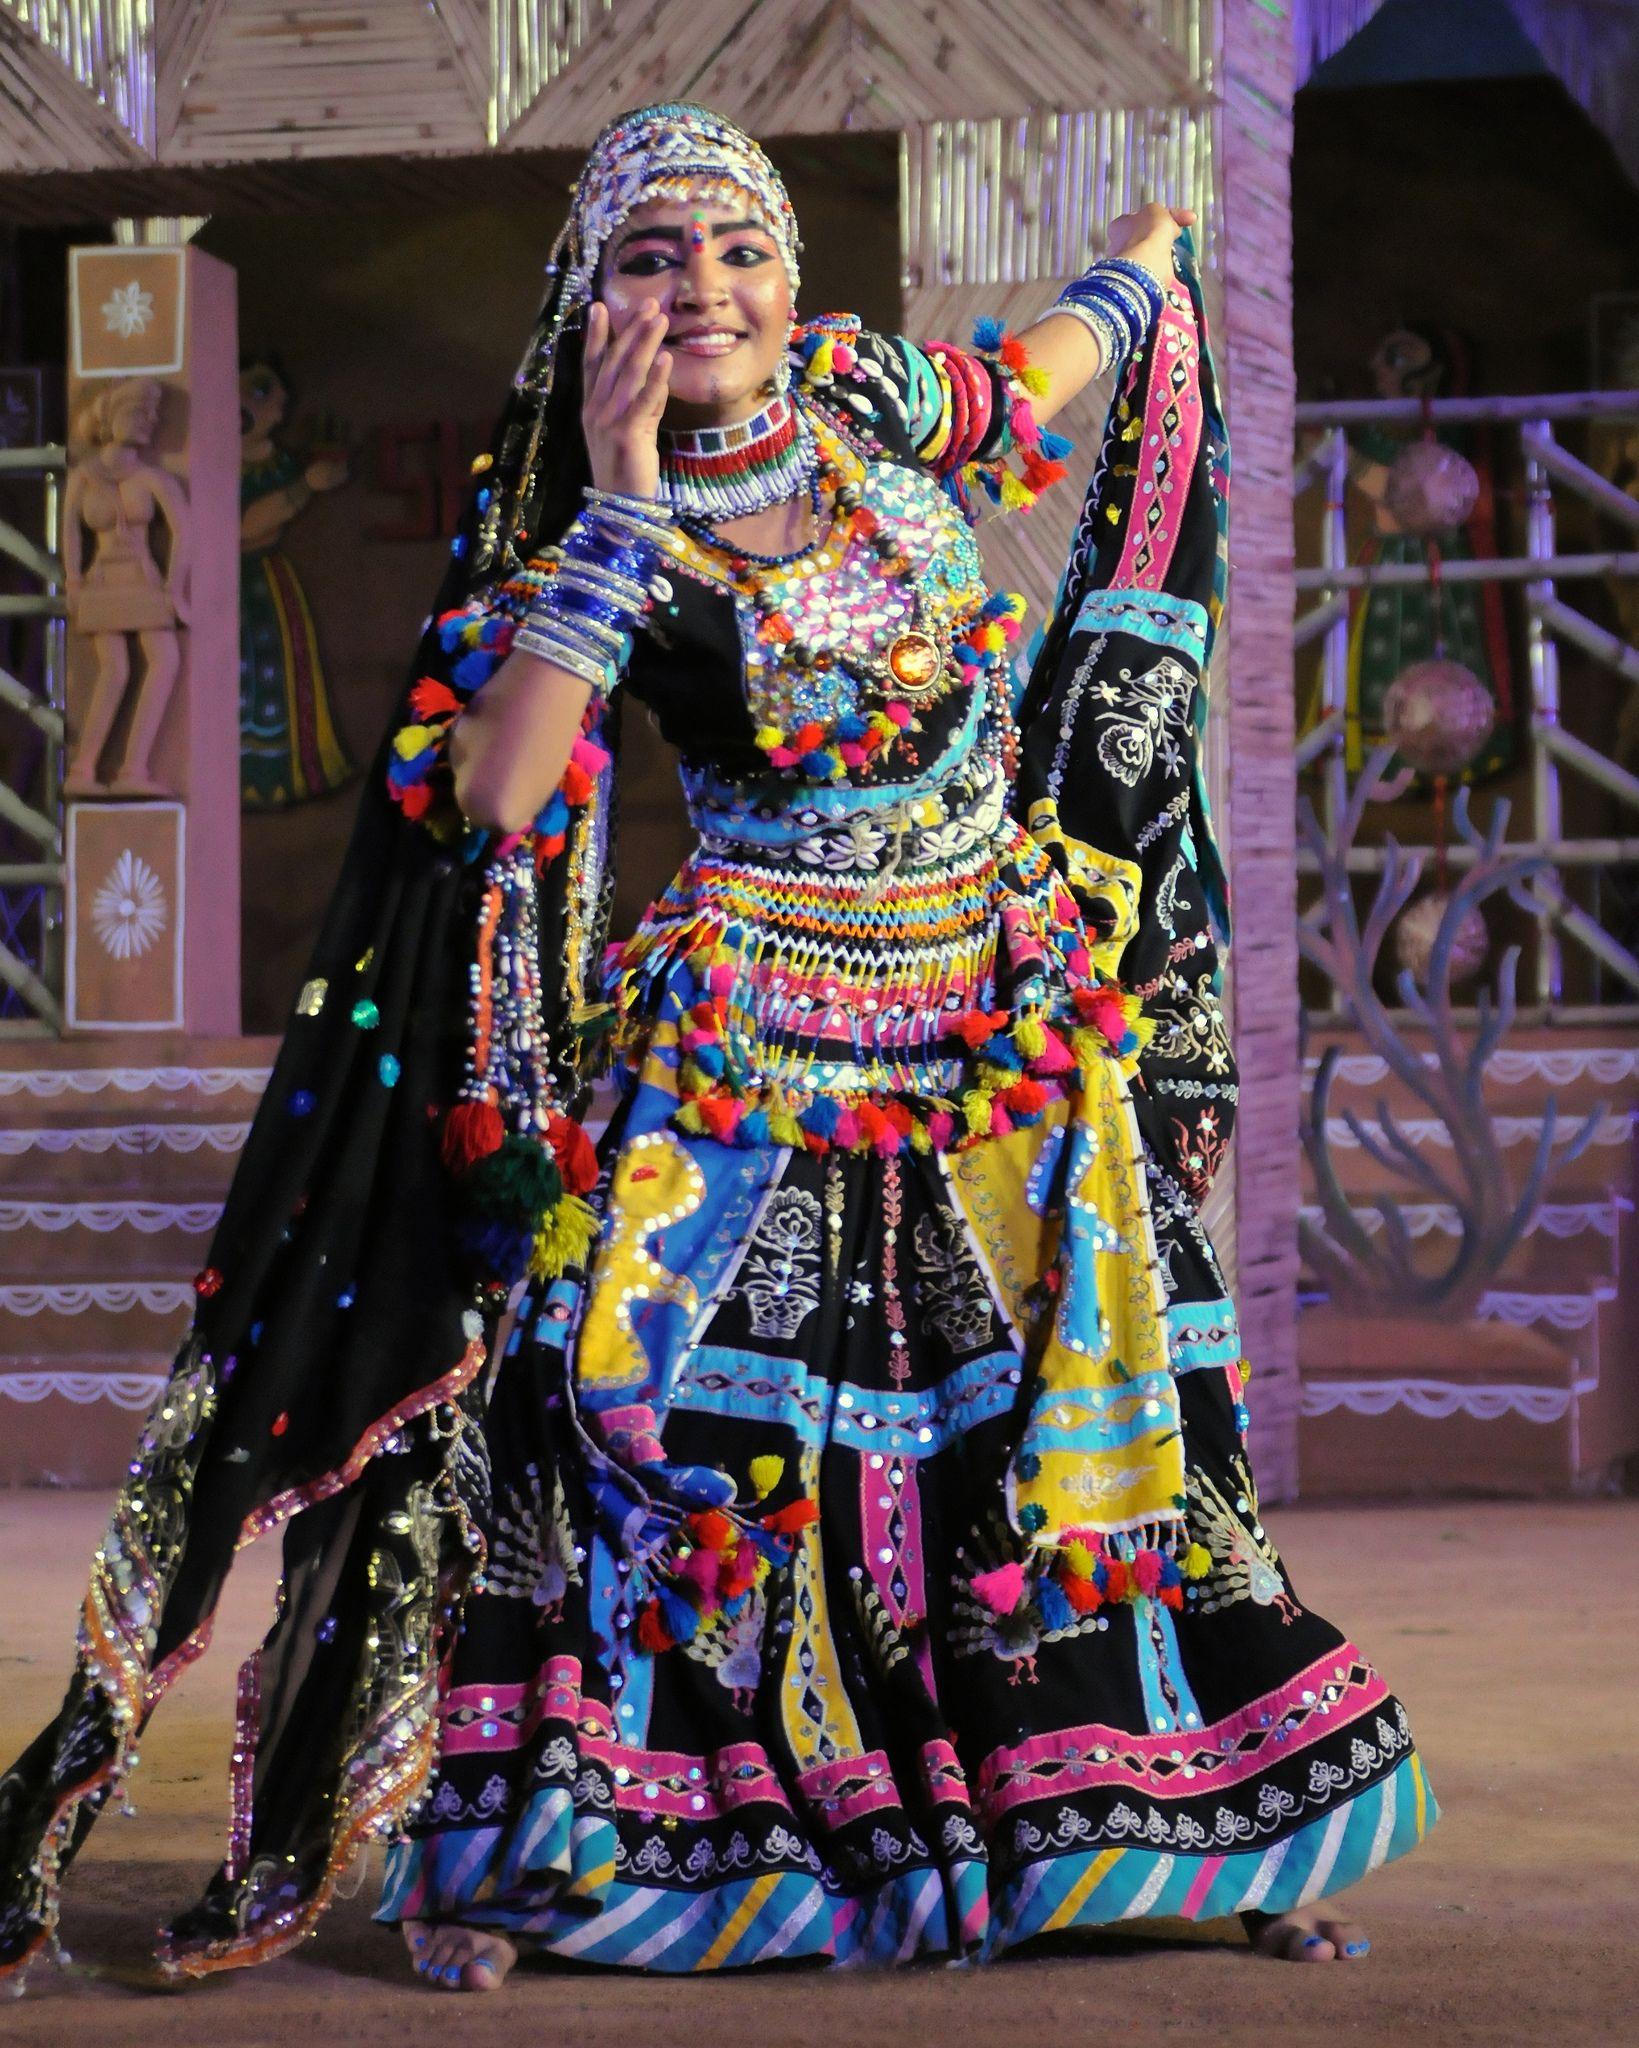 35f75ea21052 Kalbelia dancer at Shilpgram Fair - Udaipur, India in 2019 | Artdoll ...